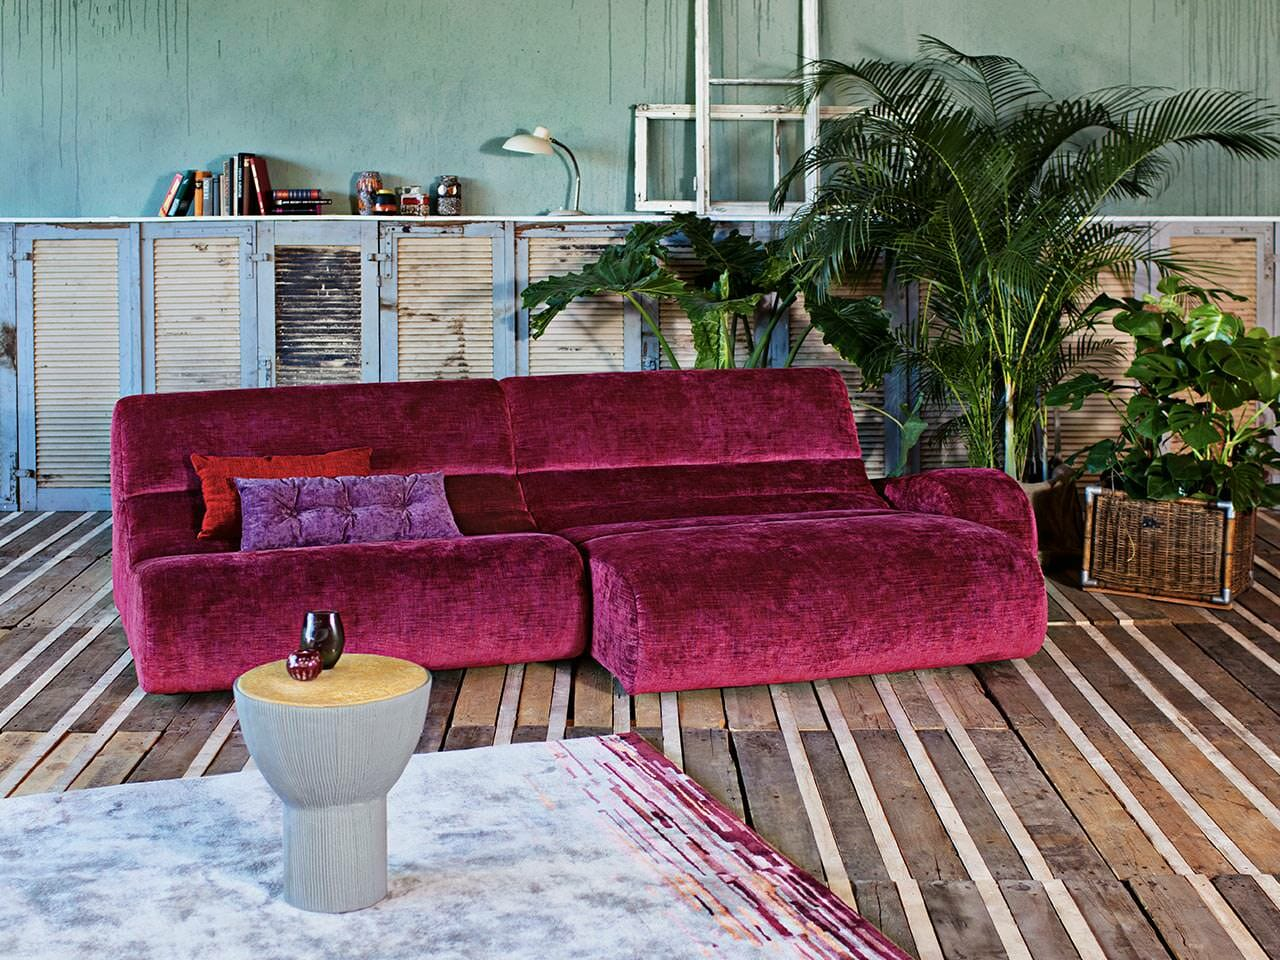 bretz myami sofa top angebot an bretz myami designsofas. Black Bedroom Furniture Sets. Home Design Ideas